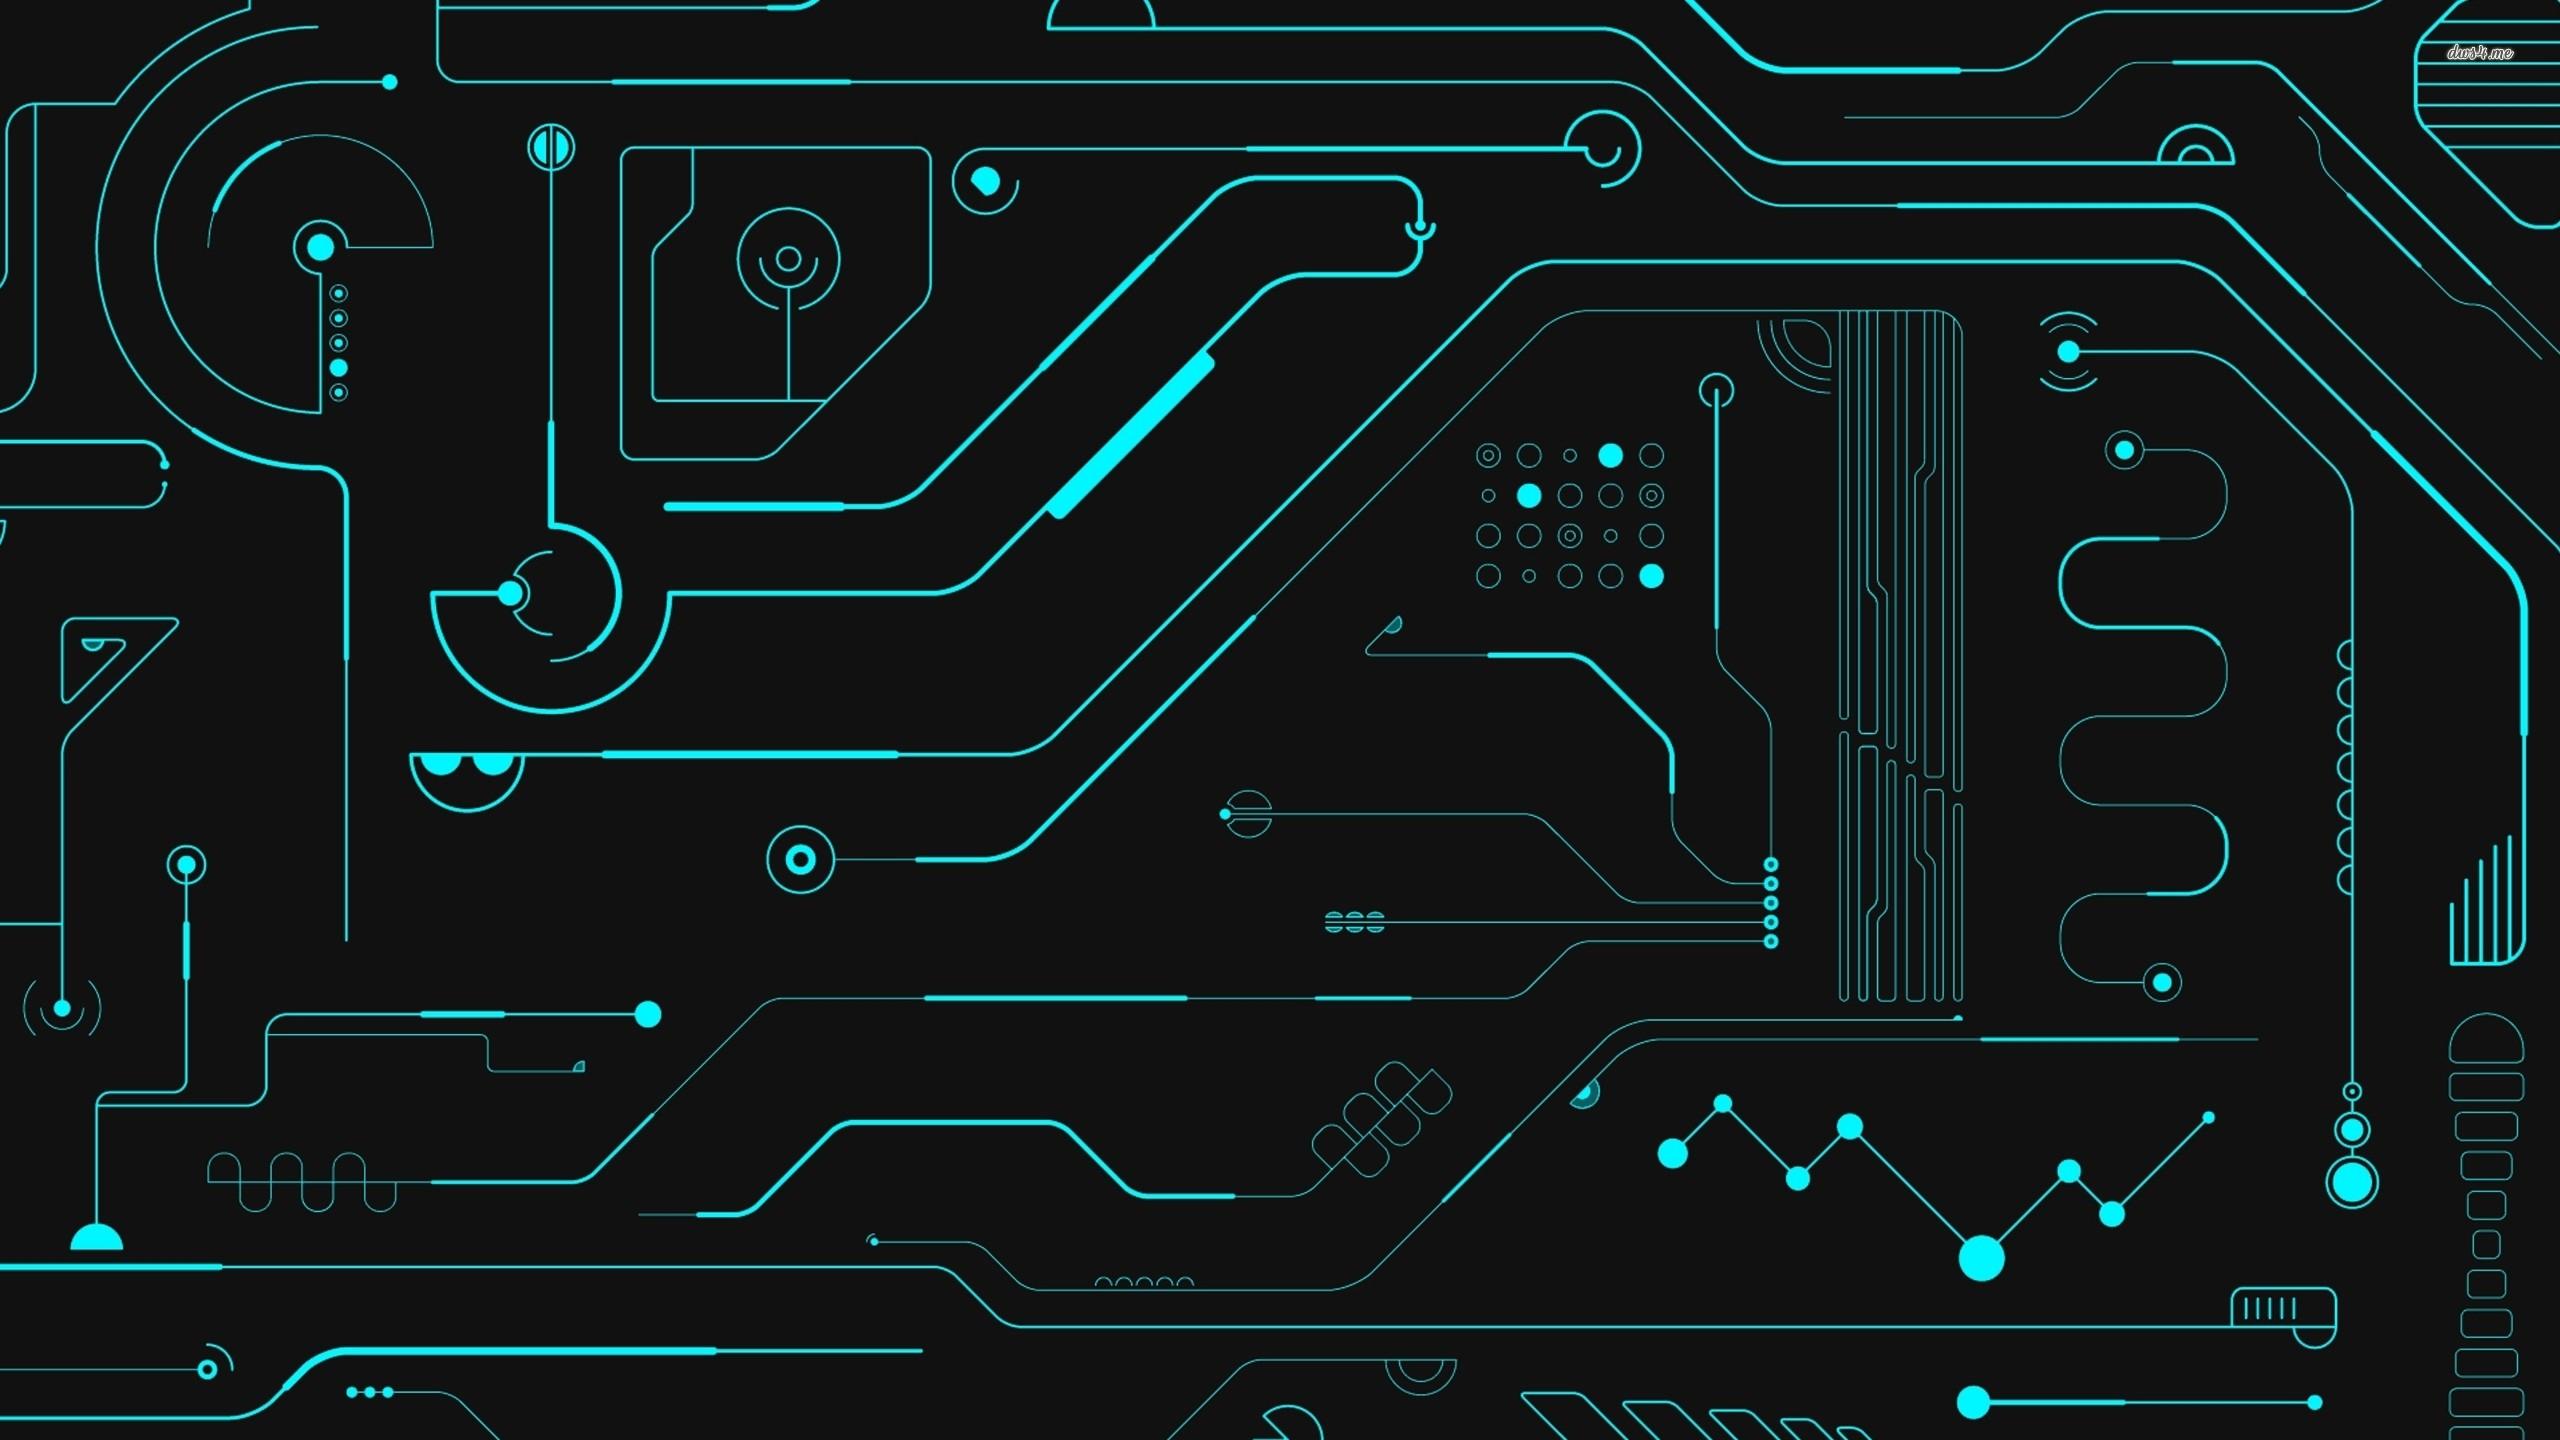 Electric Circuit, Desktop Wallpapers